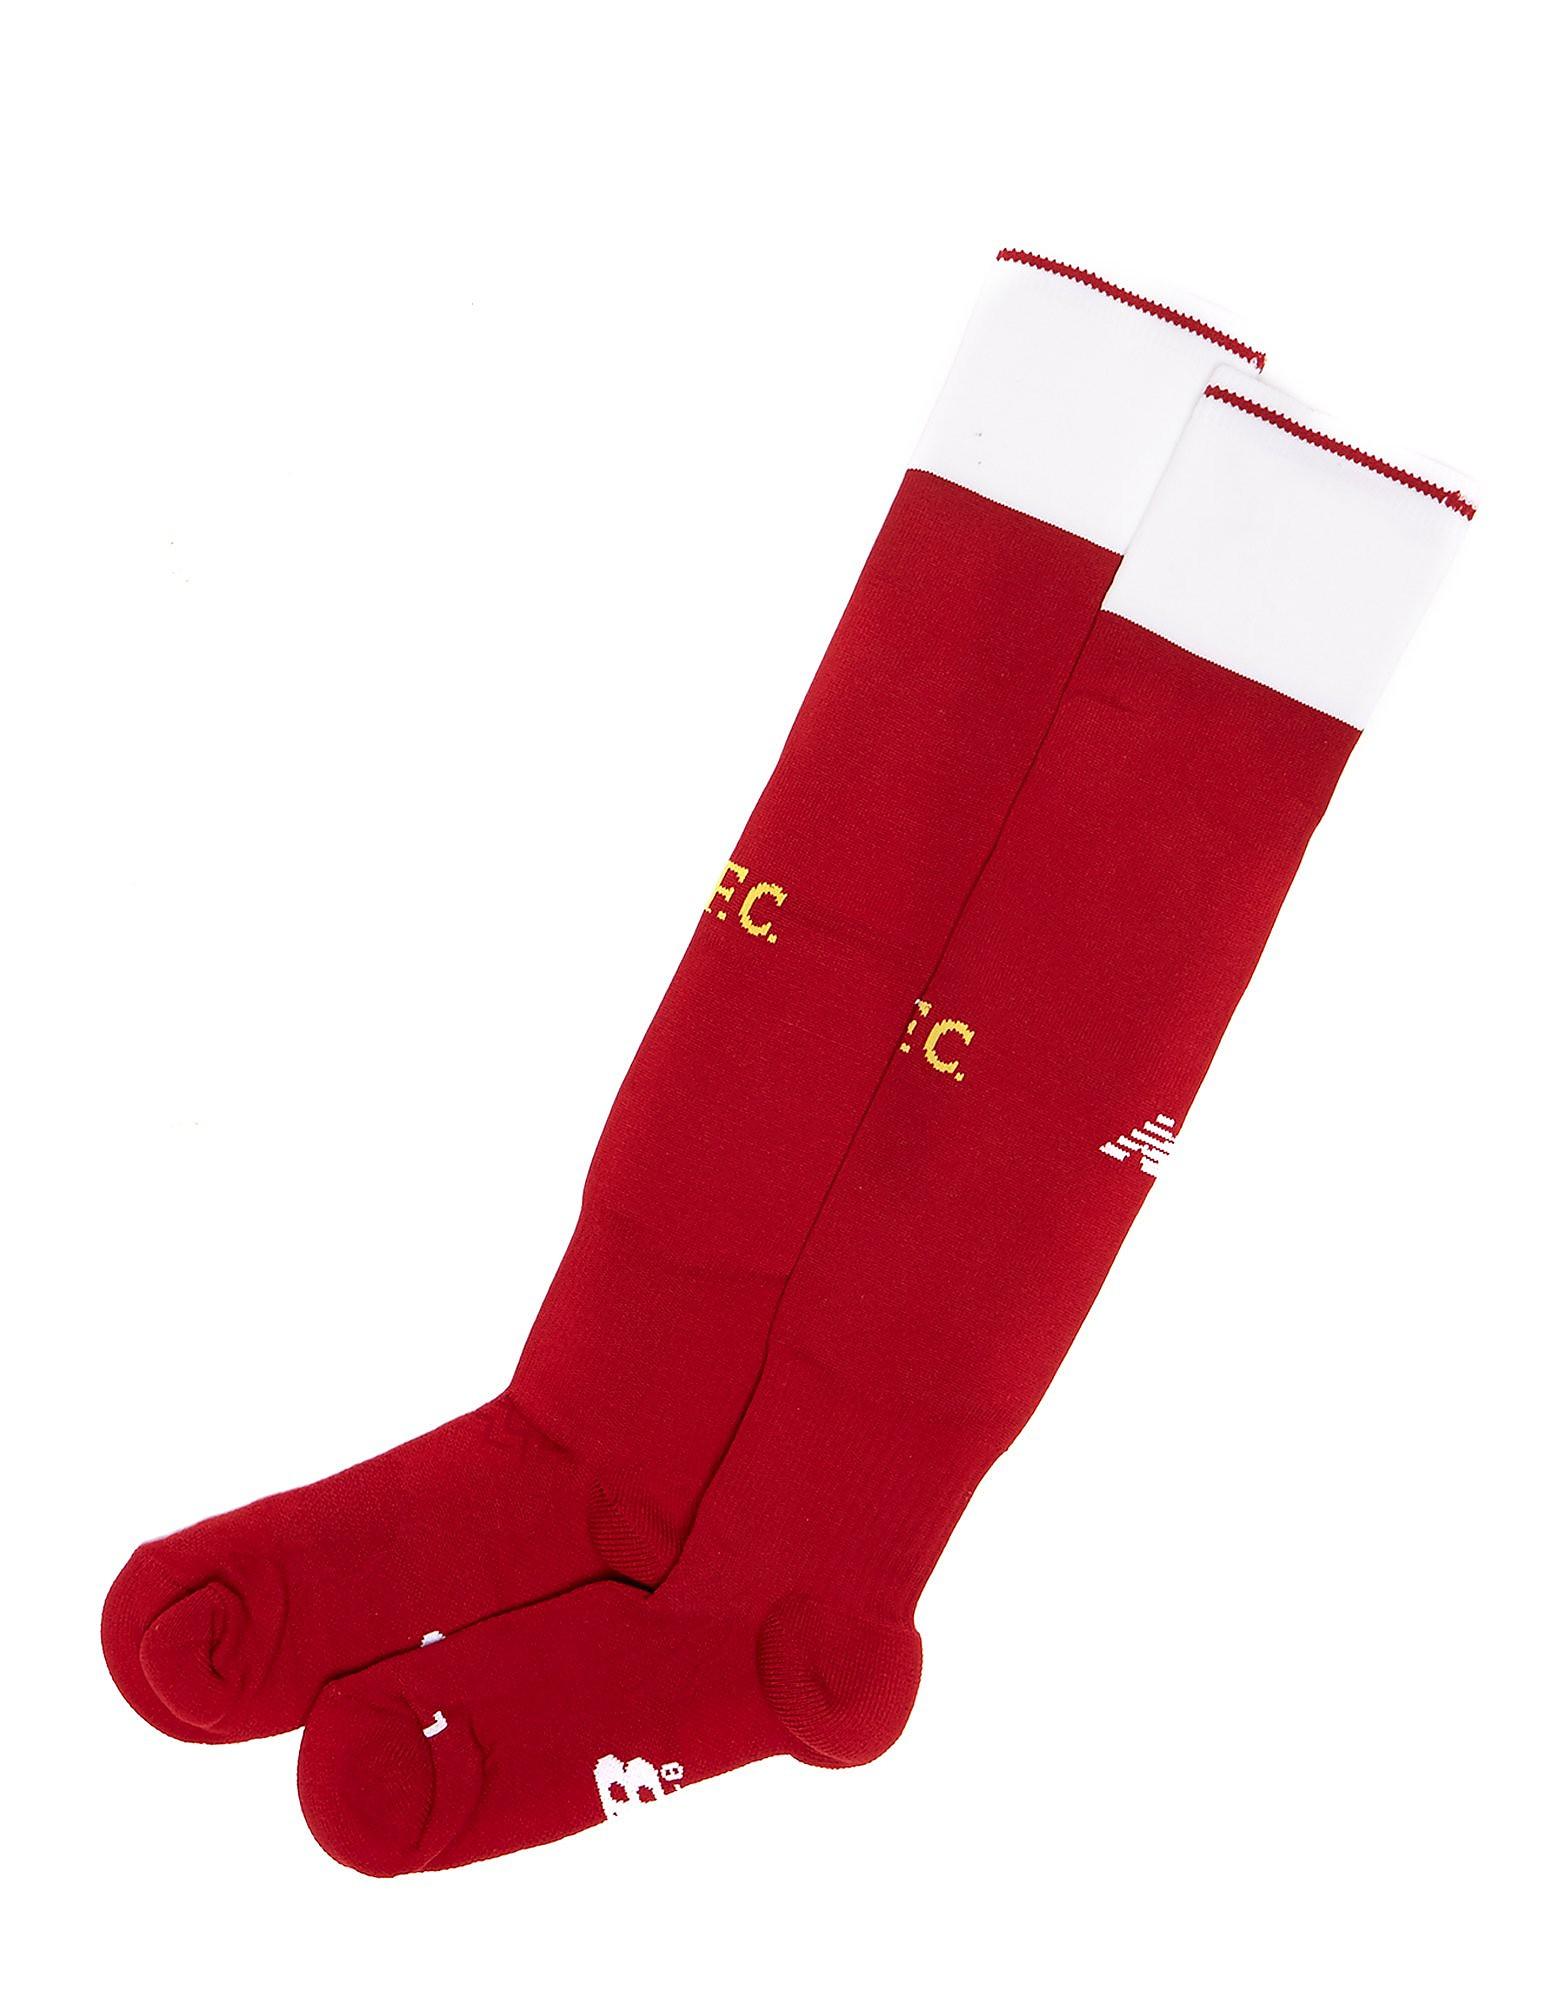 New Balance Liverpool FC 2017/18 Home Socks